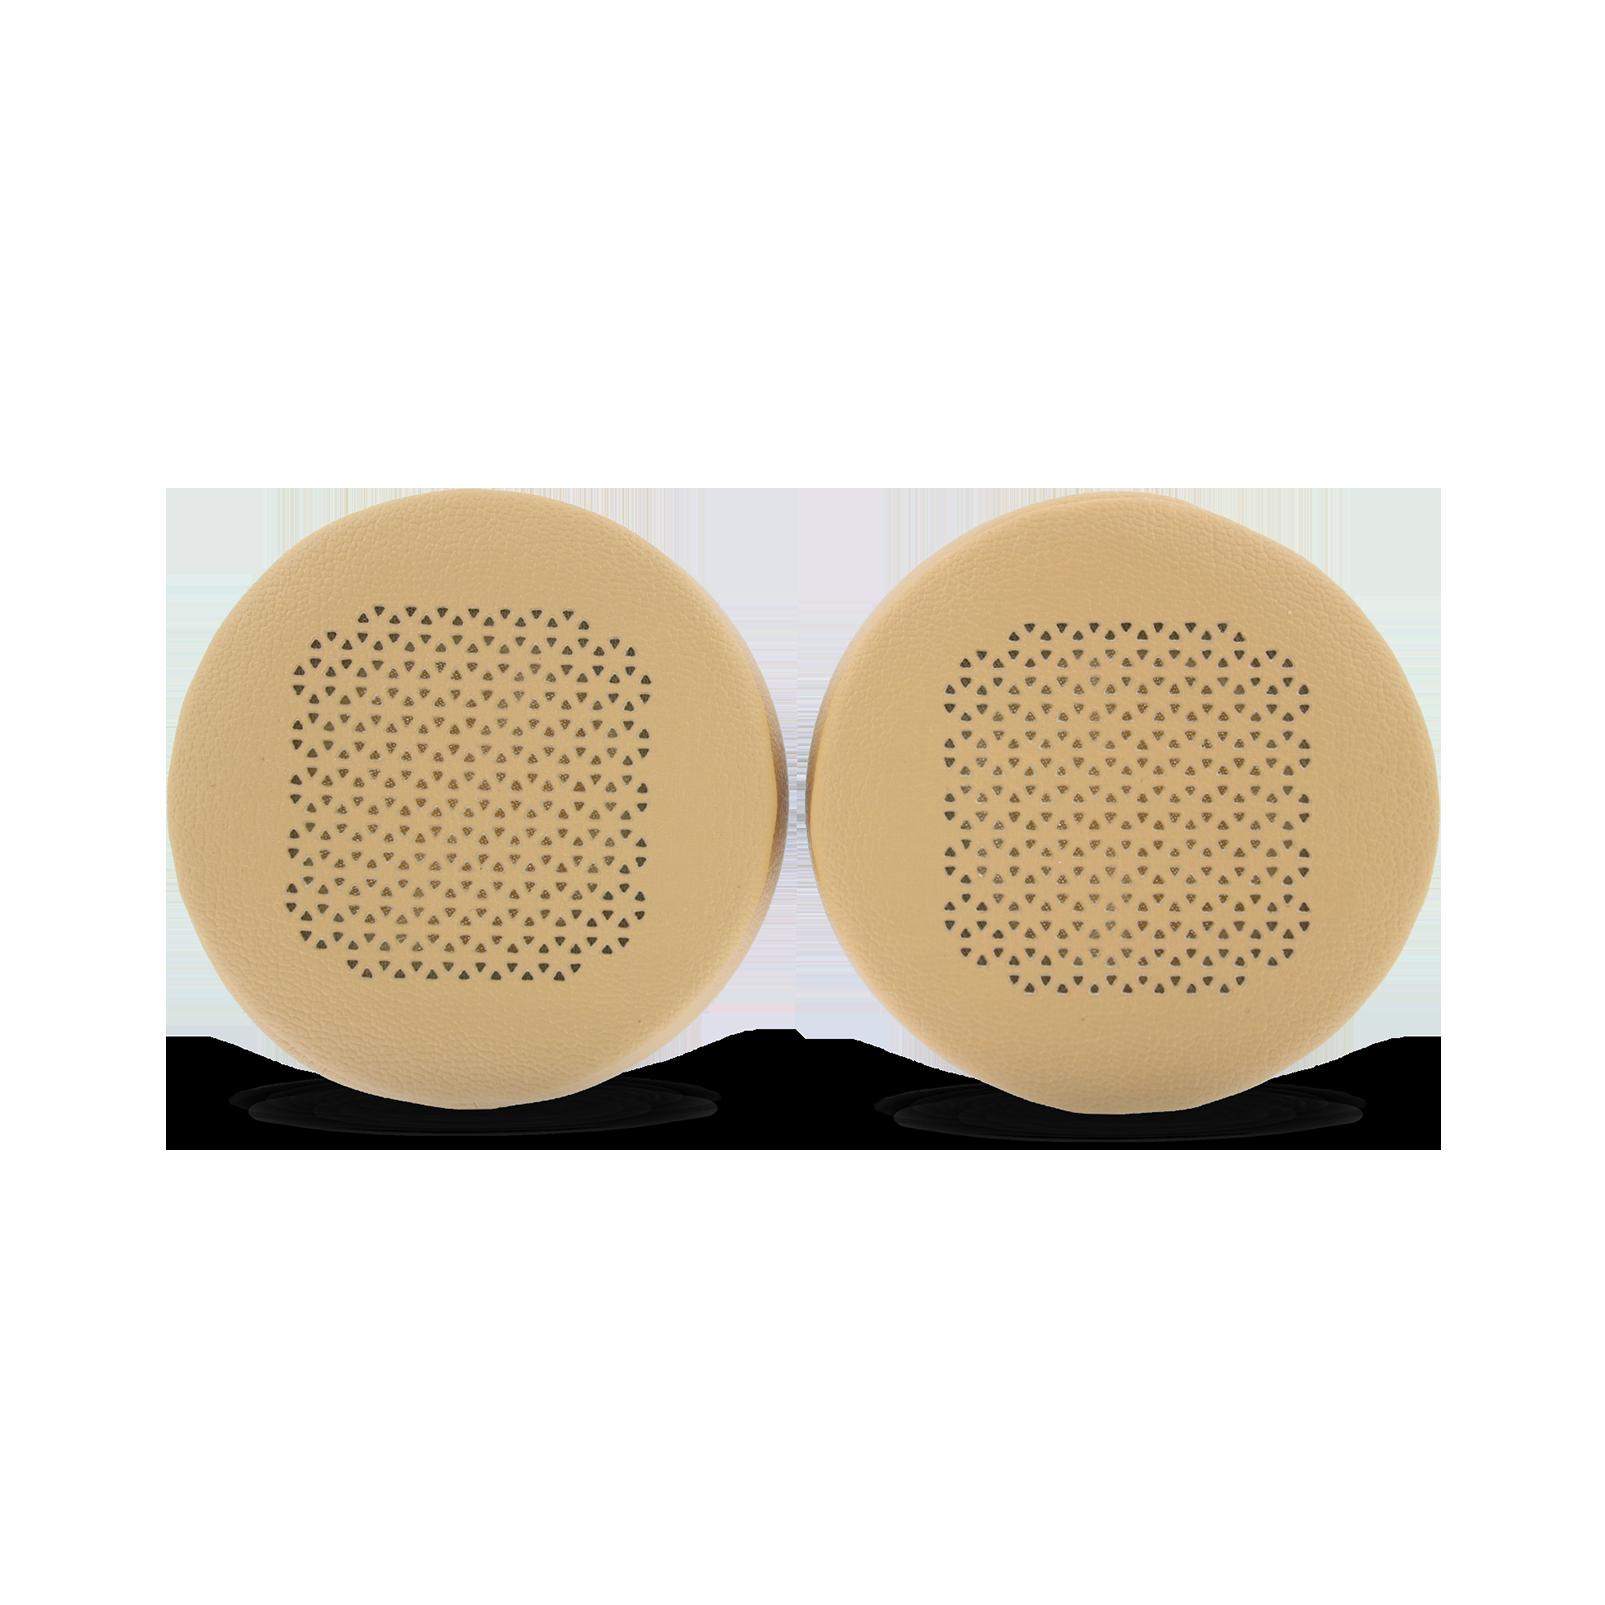 Ear pad set for DUET BT - Grey - Ear pads (L+R) - Hero